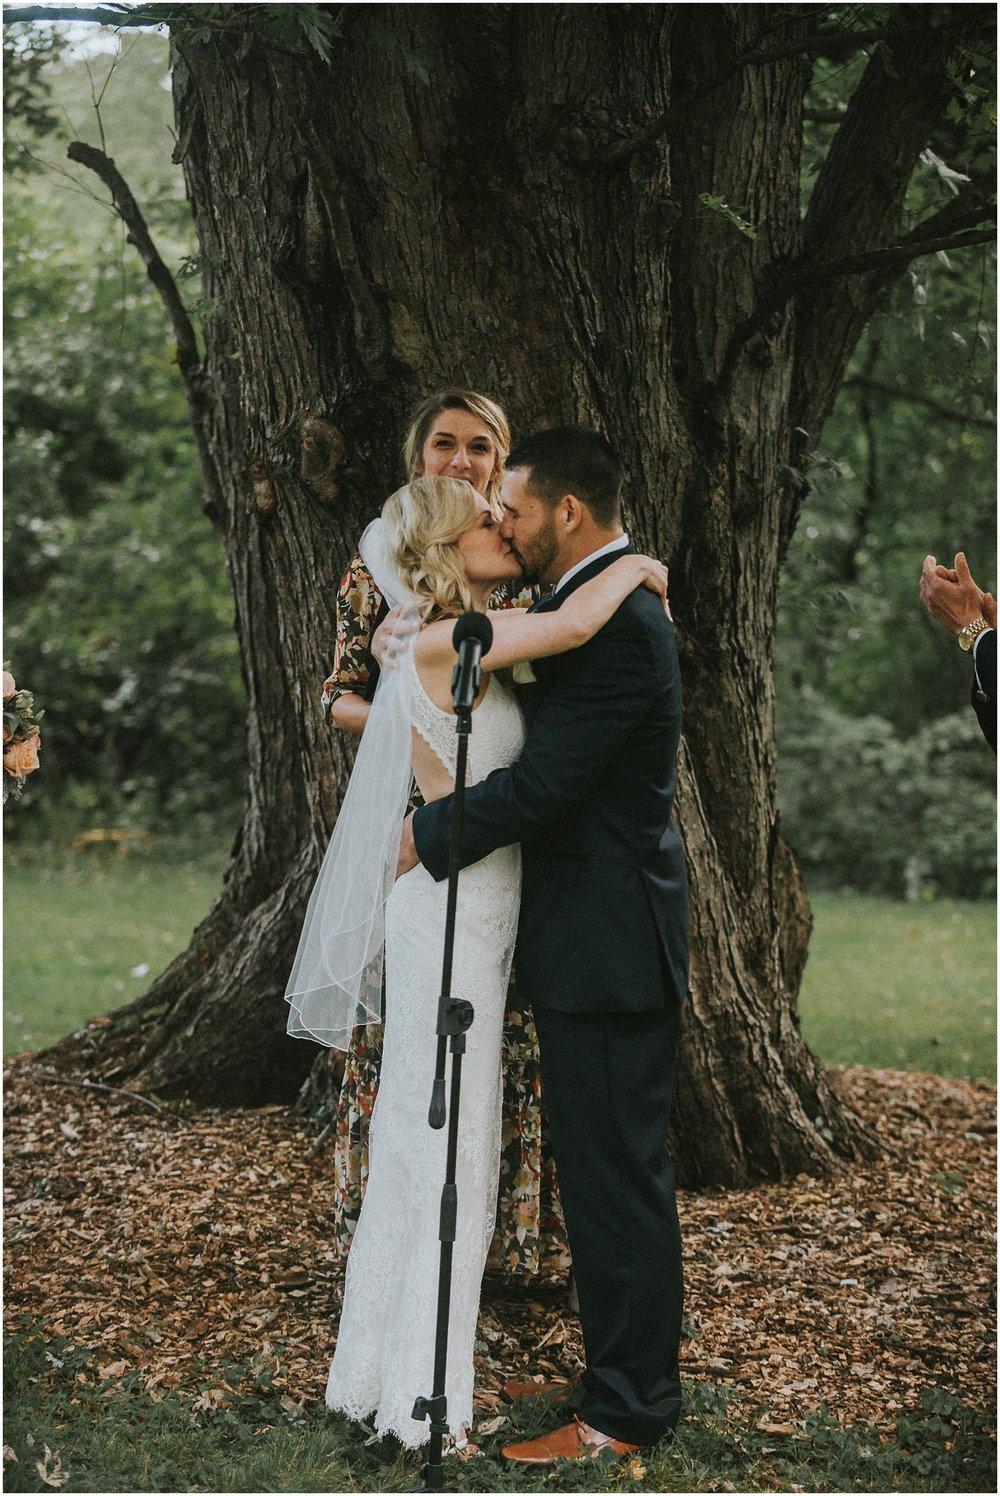 waterloo-village-waterloo village-wedding-outdoor wedding-rustic-boemian-new jersey-bride-groom-wedding party-davids bridal-wedding dress-wedding-first kiss-intimate wedding_0384.jpg